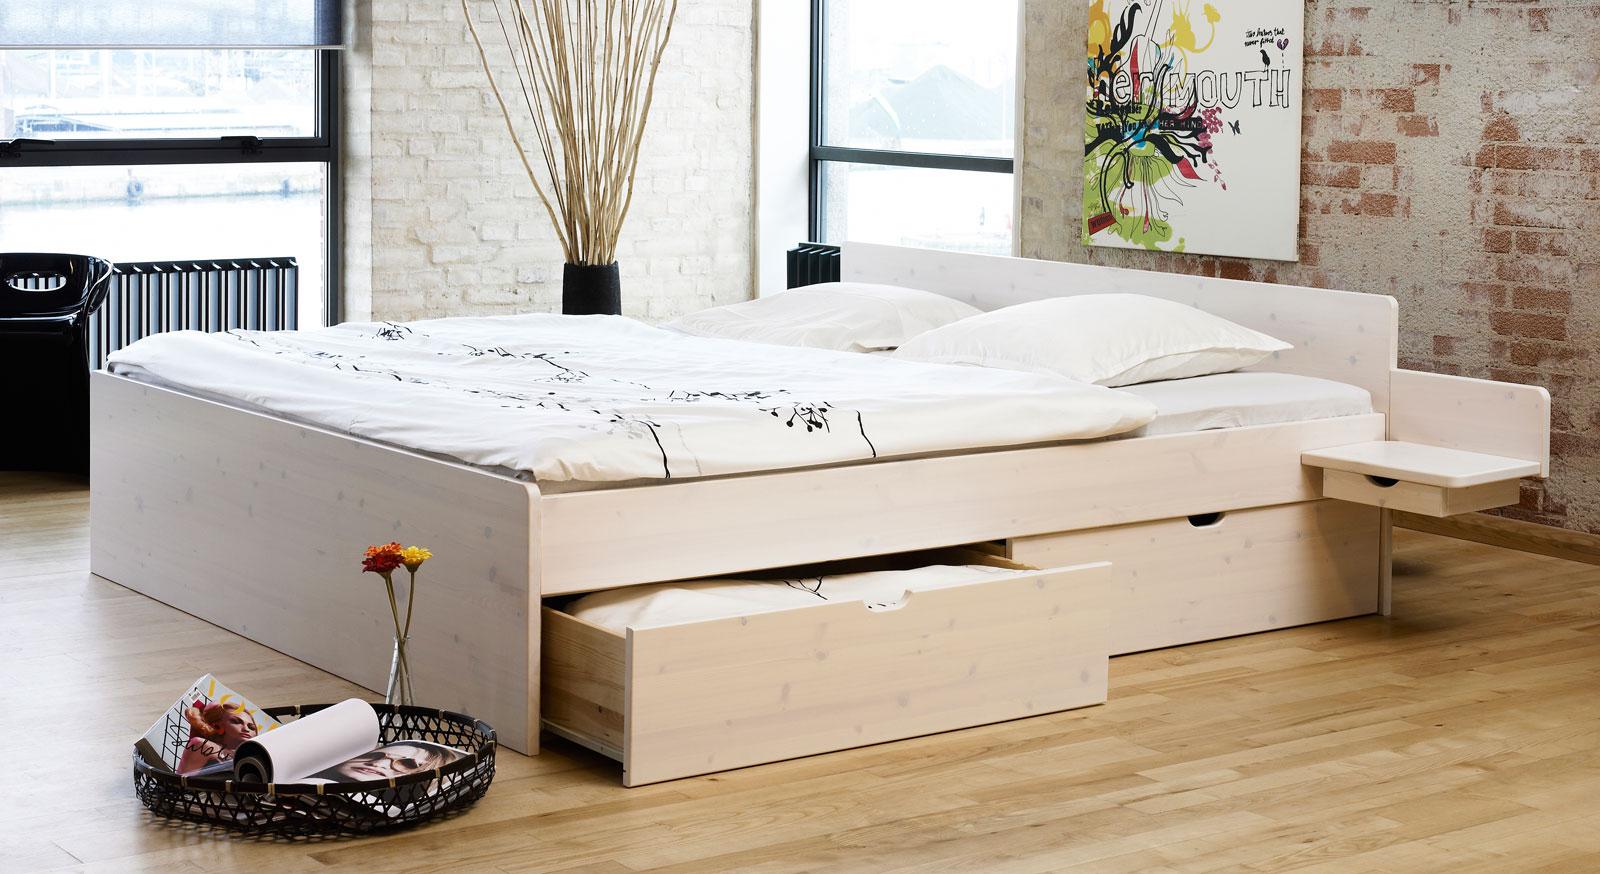 Full Size of Betten Ikea 160x200 Schubkasten Doppelbett Aus Buche Oder Kiefer Bett Norwegen Küche Kosten Günstig Kaufen 180x200 Jensen Massivholz Köln Weißes Test Bett Betten Ikea 160x200